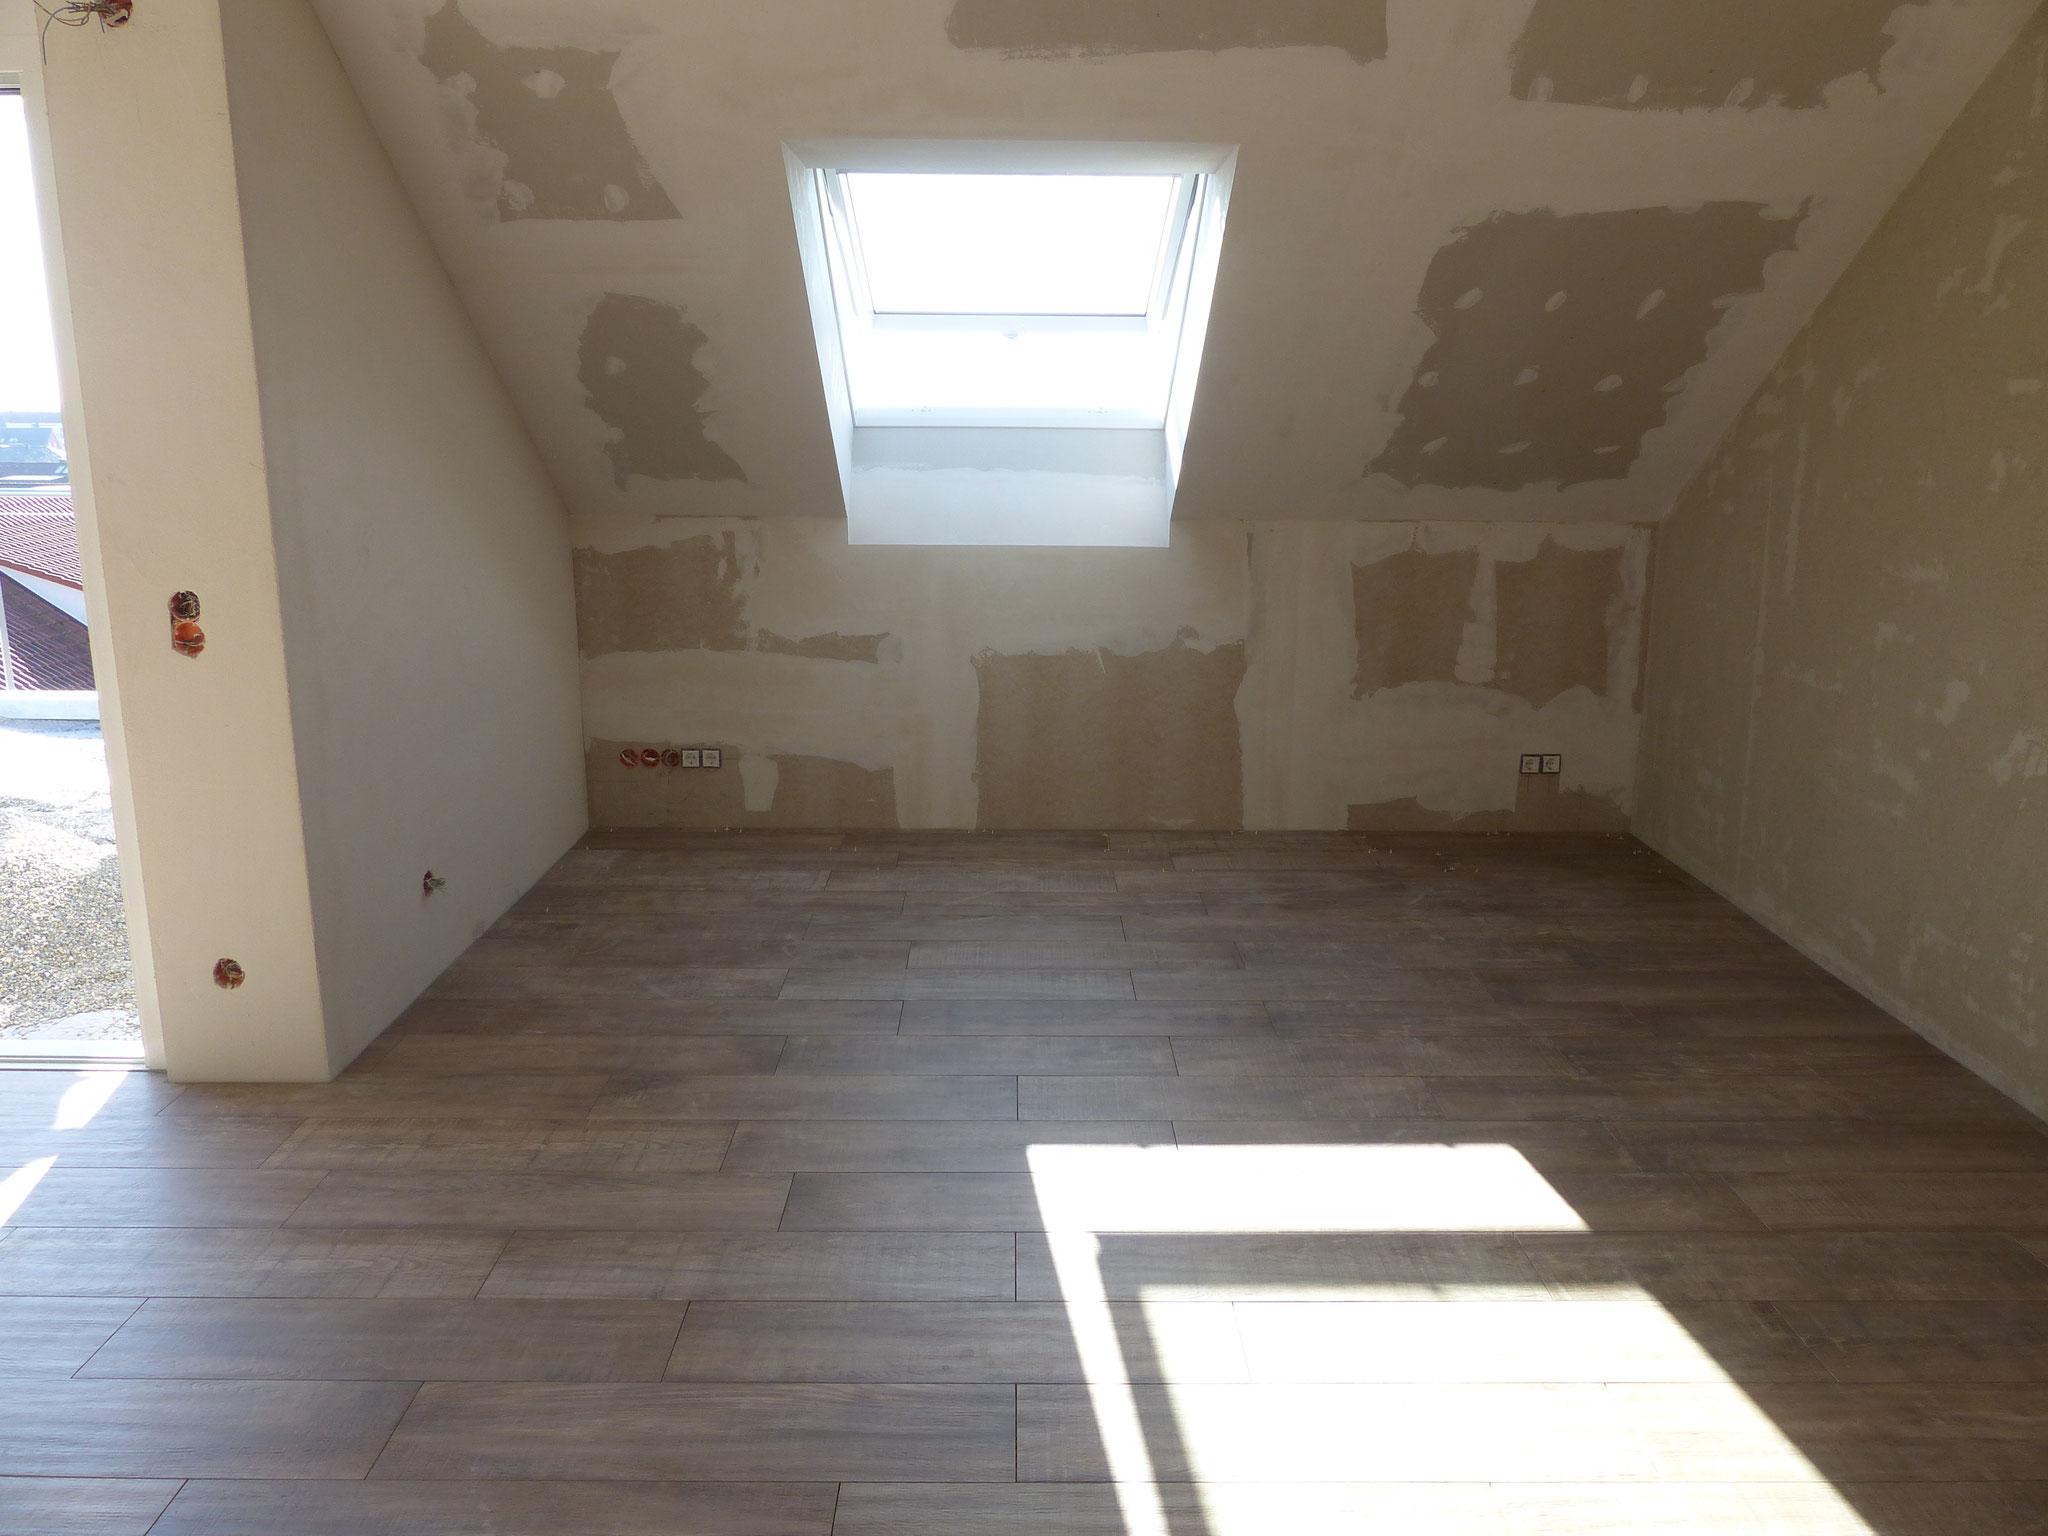 Trockenbau im Dachgeschoss: Verkleidung der Decke mit GKB inkl. Verspachtelung